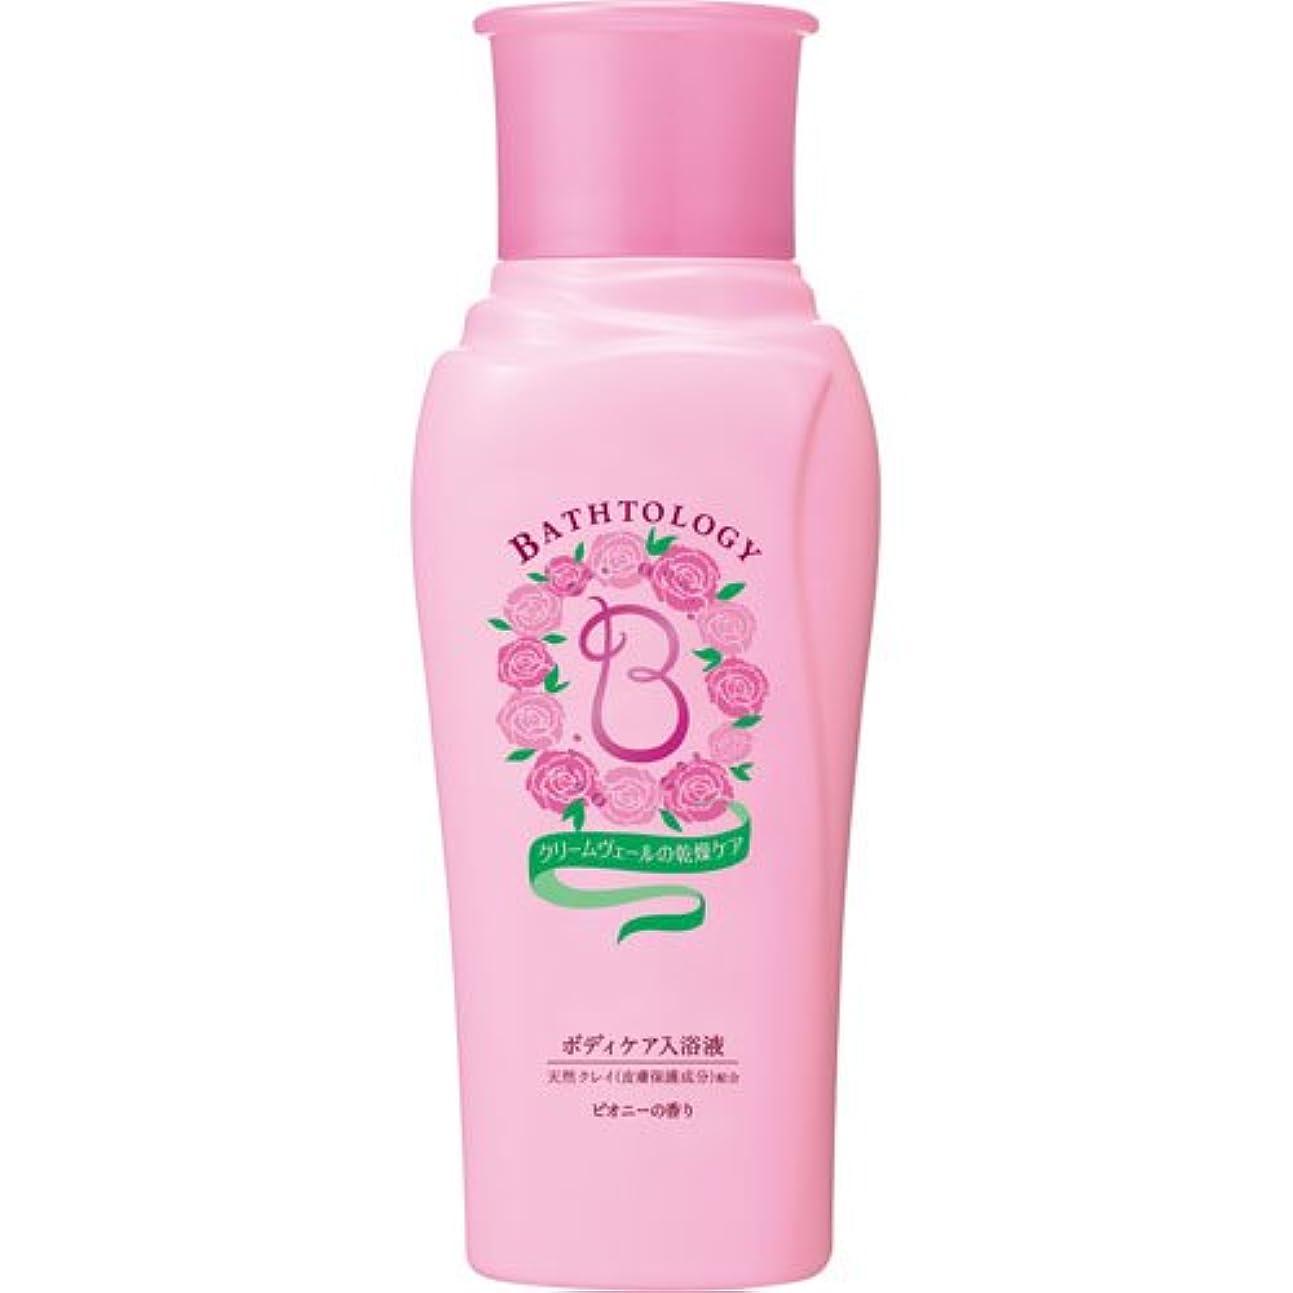 BATHTOLOGY ボディケア入浴液 ピオニーの香り 本体 450mL